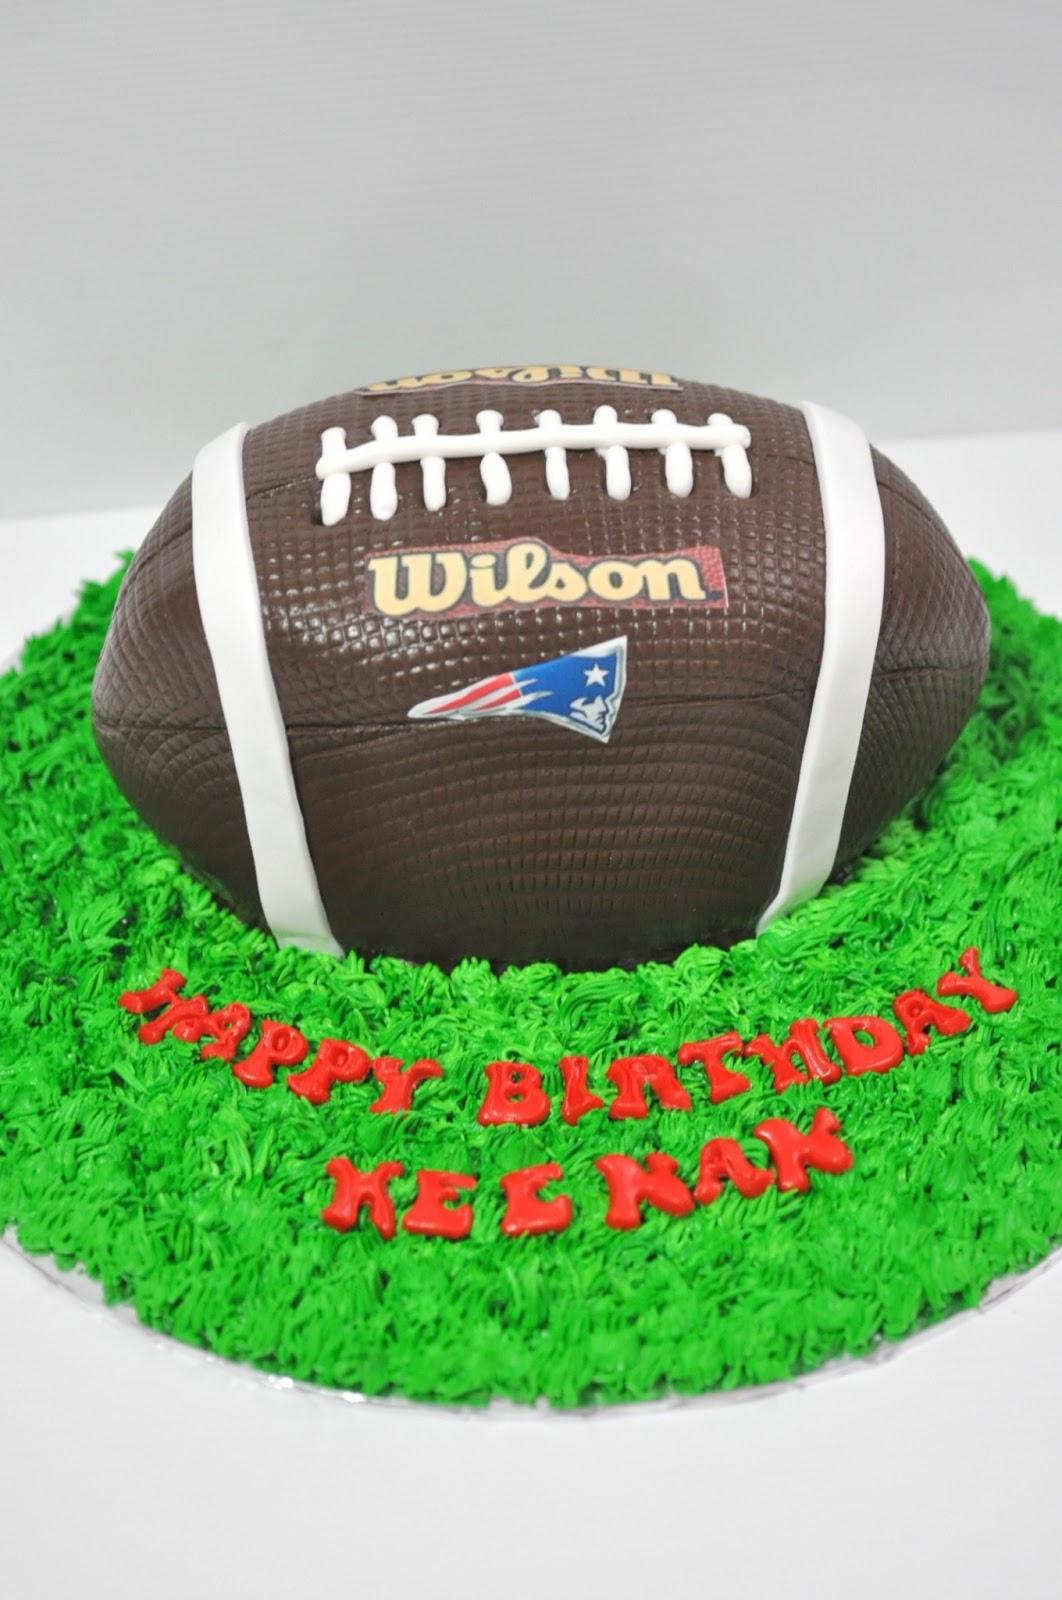 American Football Birthday Cake Ideas Digital Camera